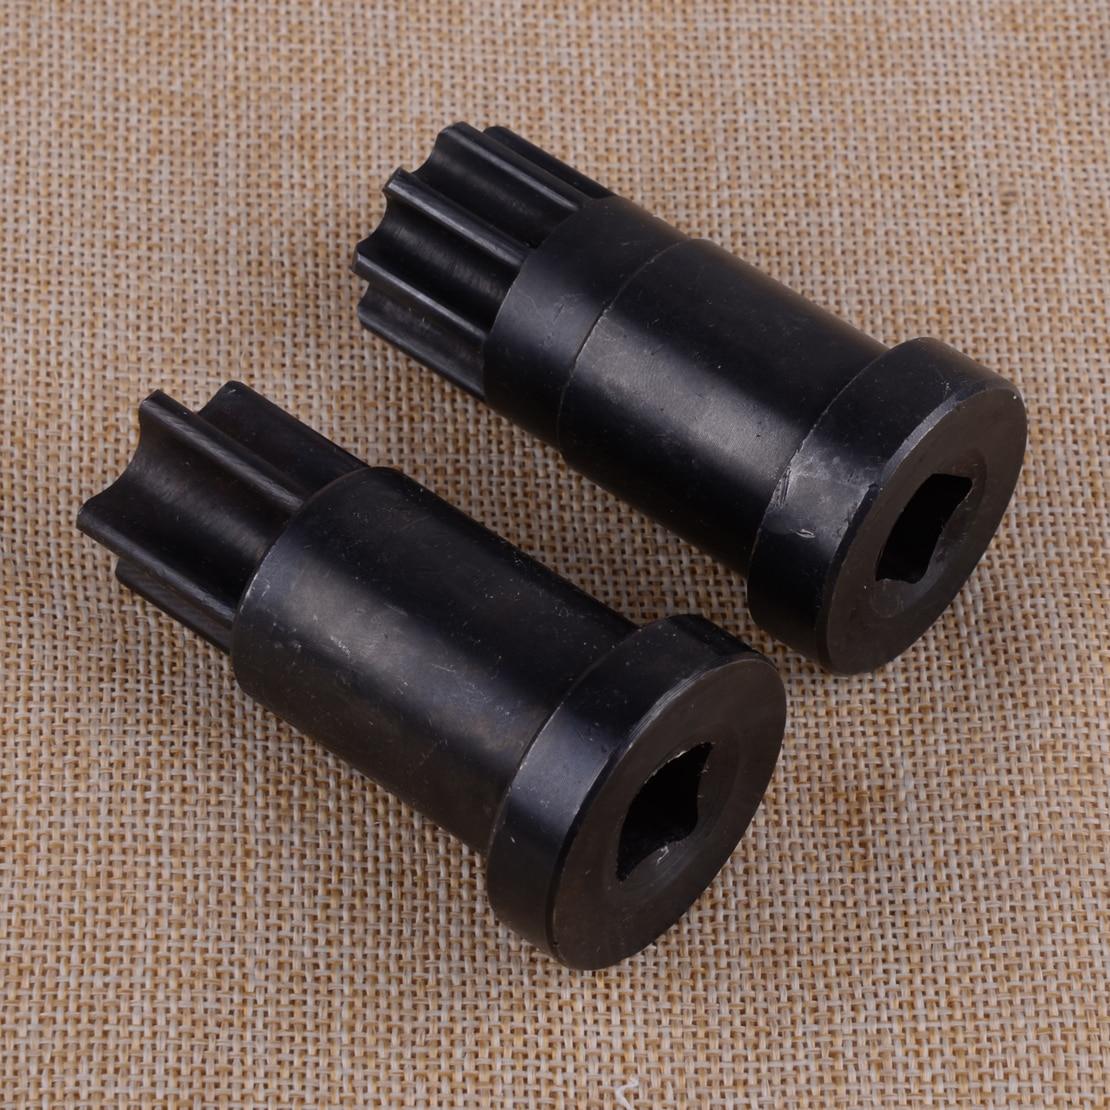 Engine Barring Socket//Wrench for G M G-M Mack E7//E-7 ETEC Caterpillar EUI//MUI engines J-38587-A 9S9082 0508477 80-0054 /& 9S9082